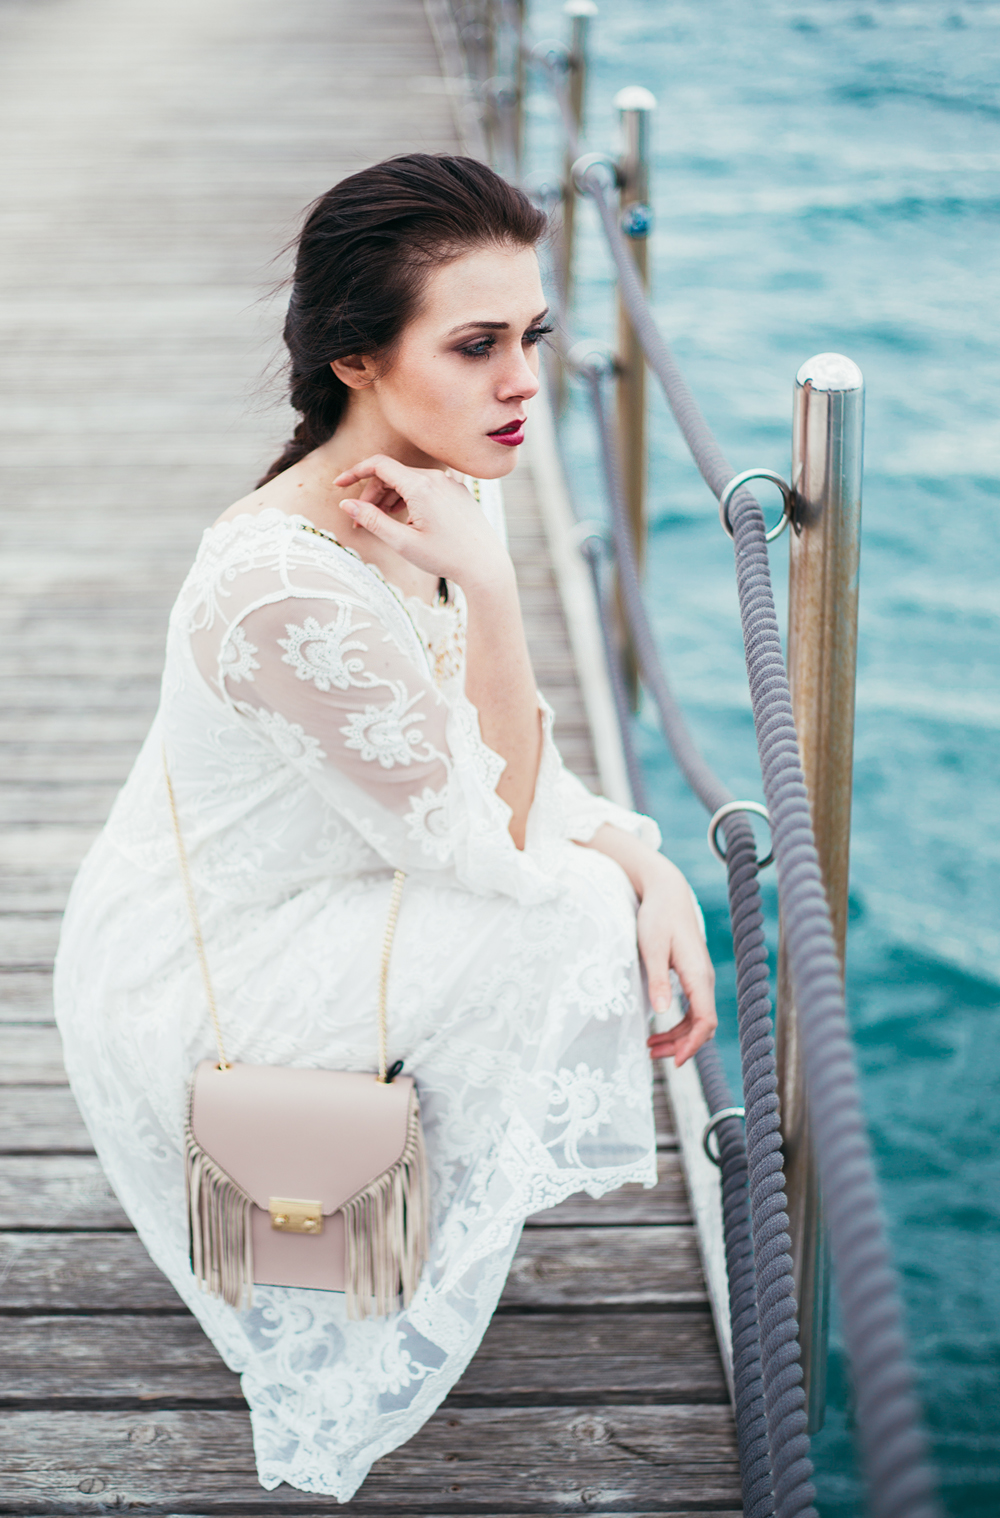 Eva Ahačevčič_Love, Eva_OOTD_FAshion blogger_Terminal 3_WHite dress_Bohemian_Romantic_Summer